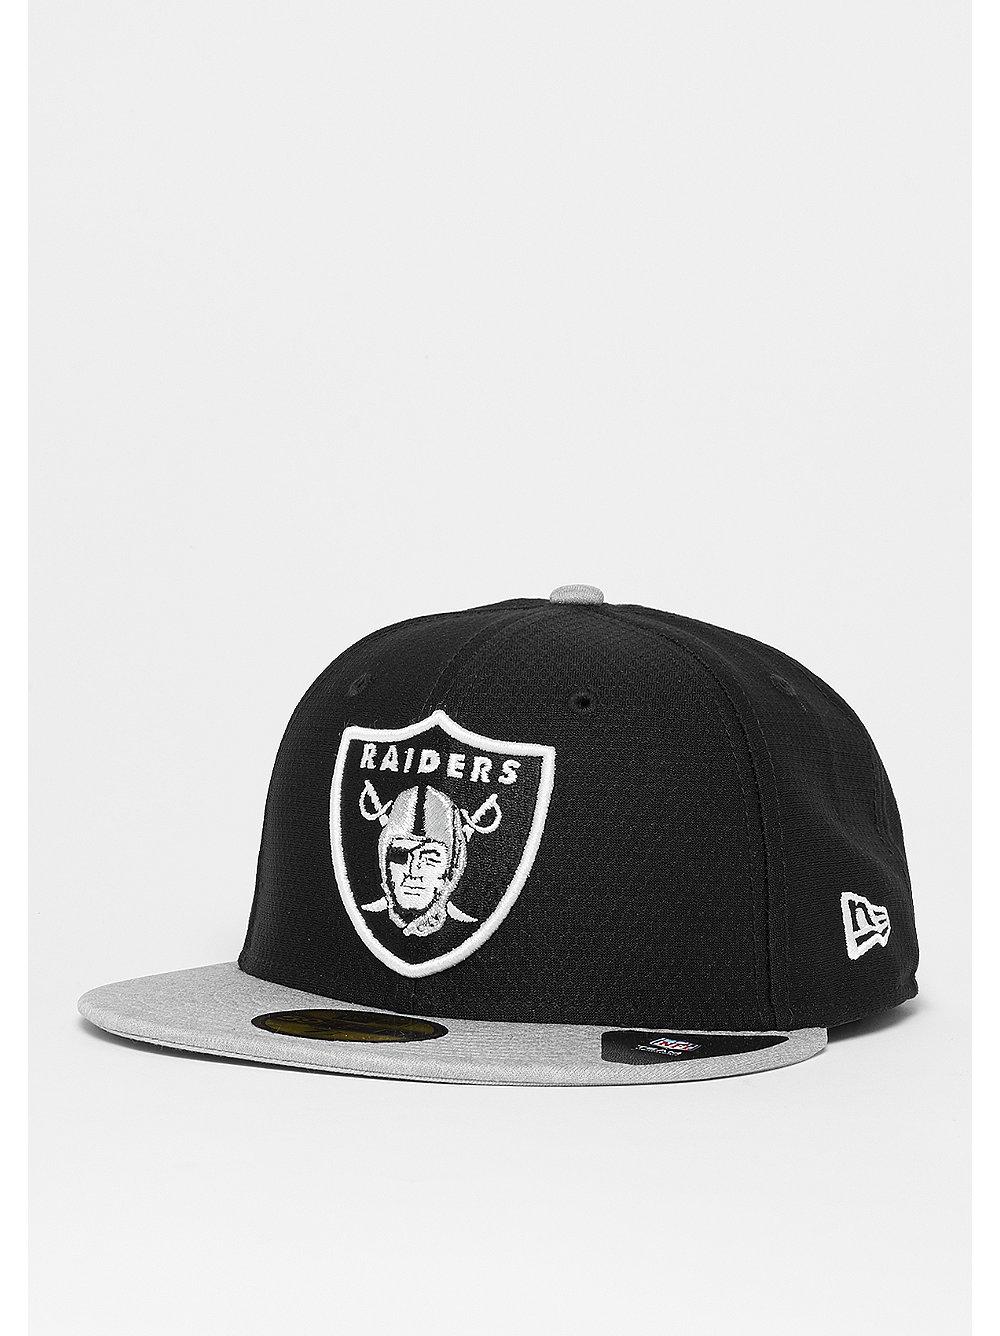 Gorra New Era 59Fifty NFL Oakland Raiders en SNIPES b6760a96900